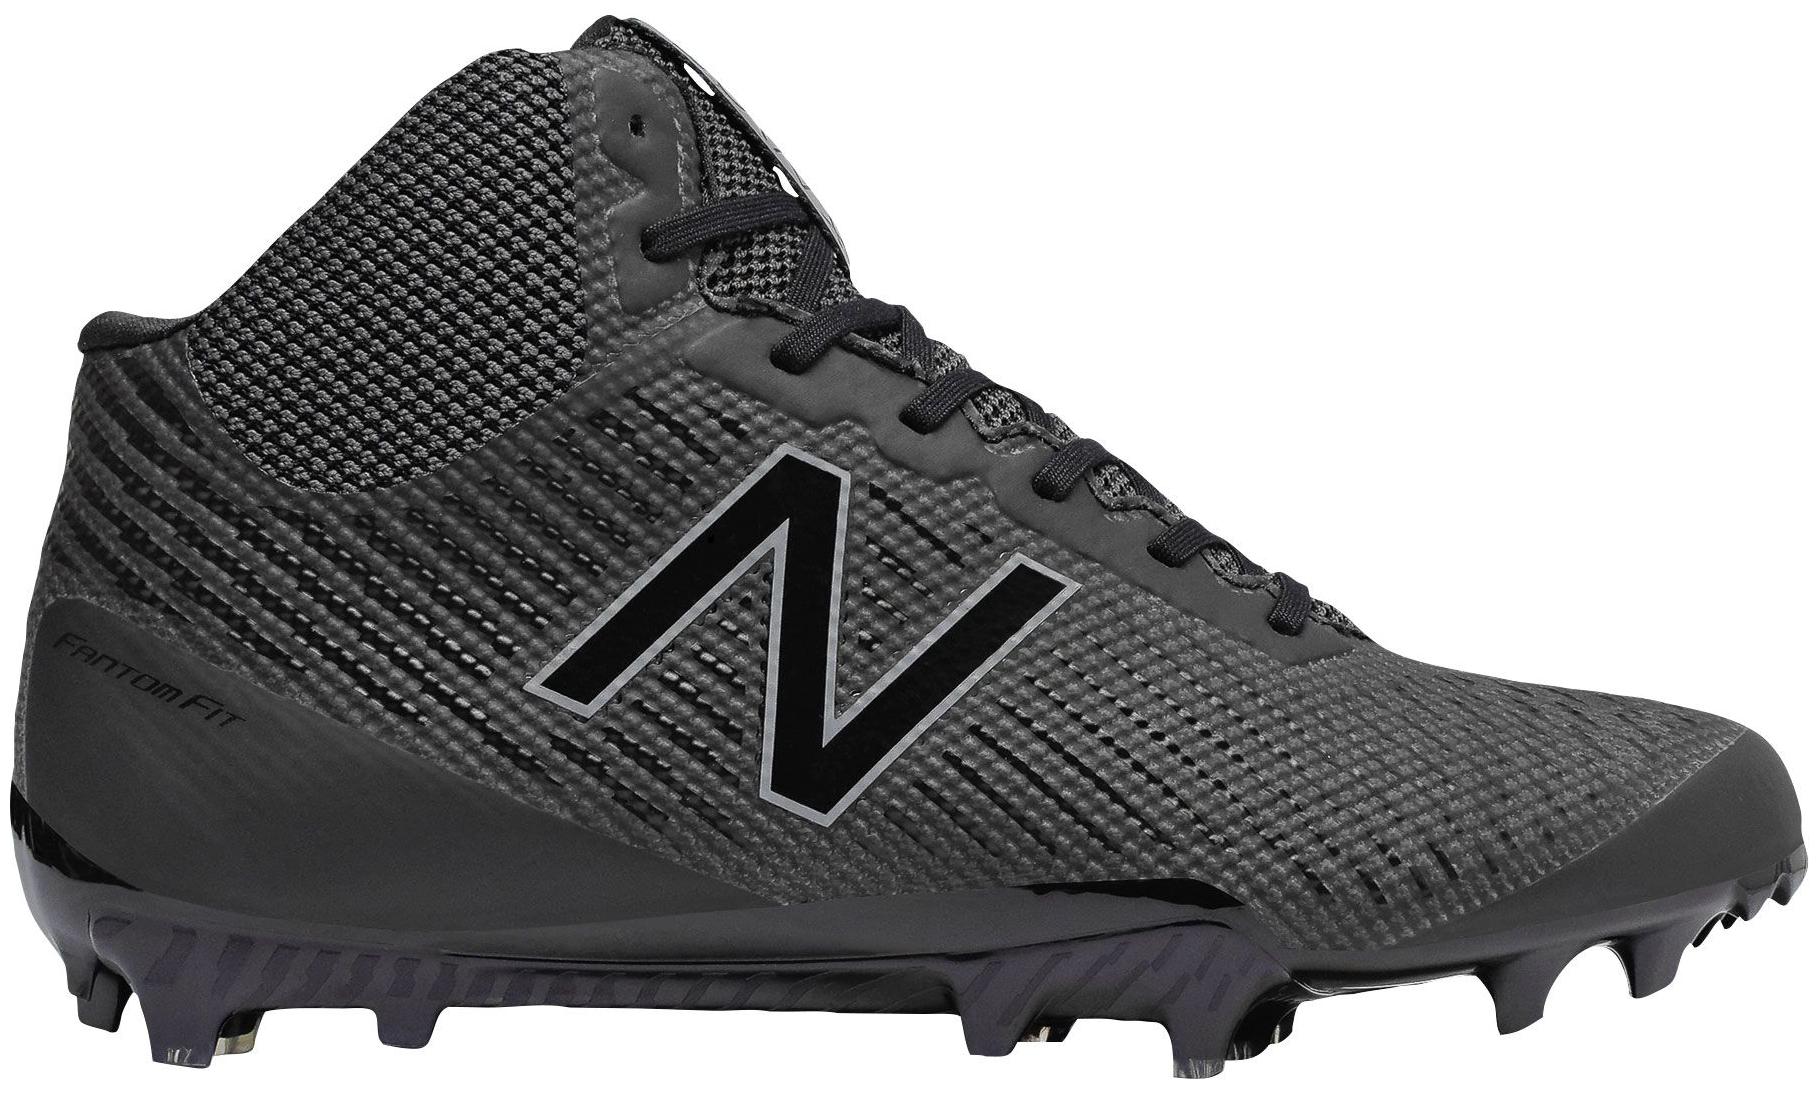 New Balance Men's Burn X Mid Lacrosse Cleats (Black Black, 6.5) by New Balance